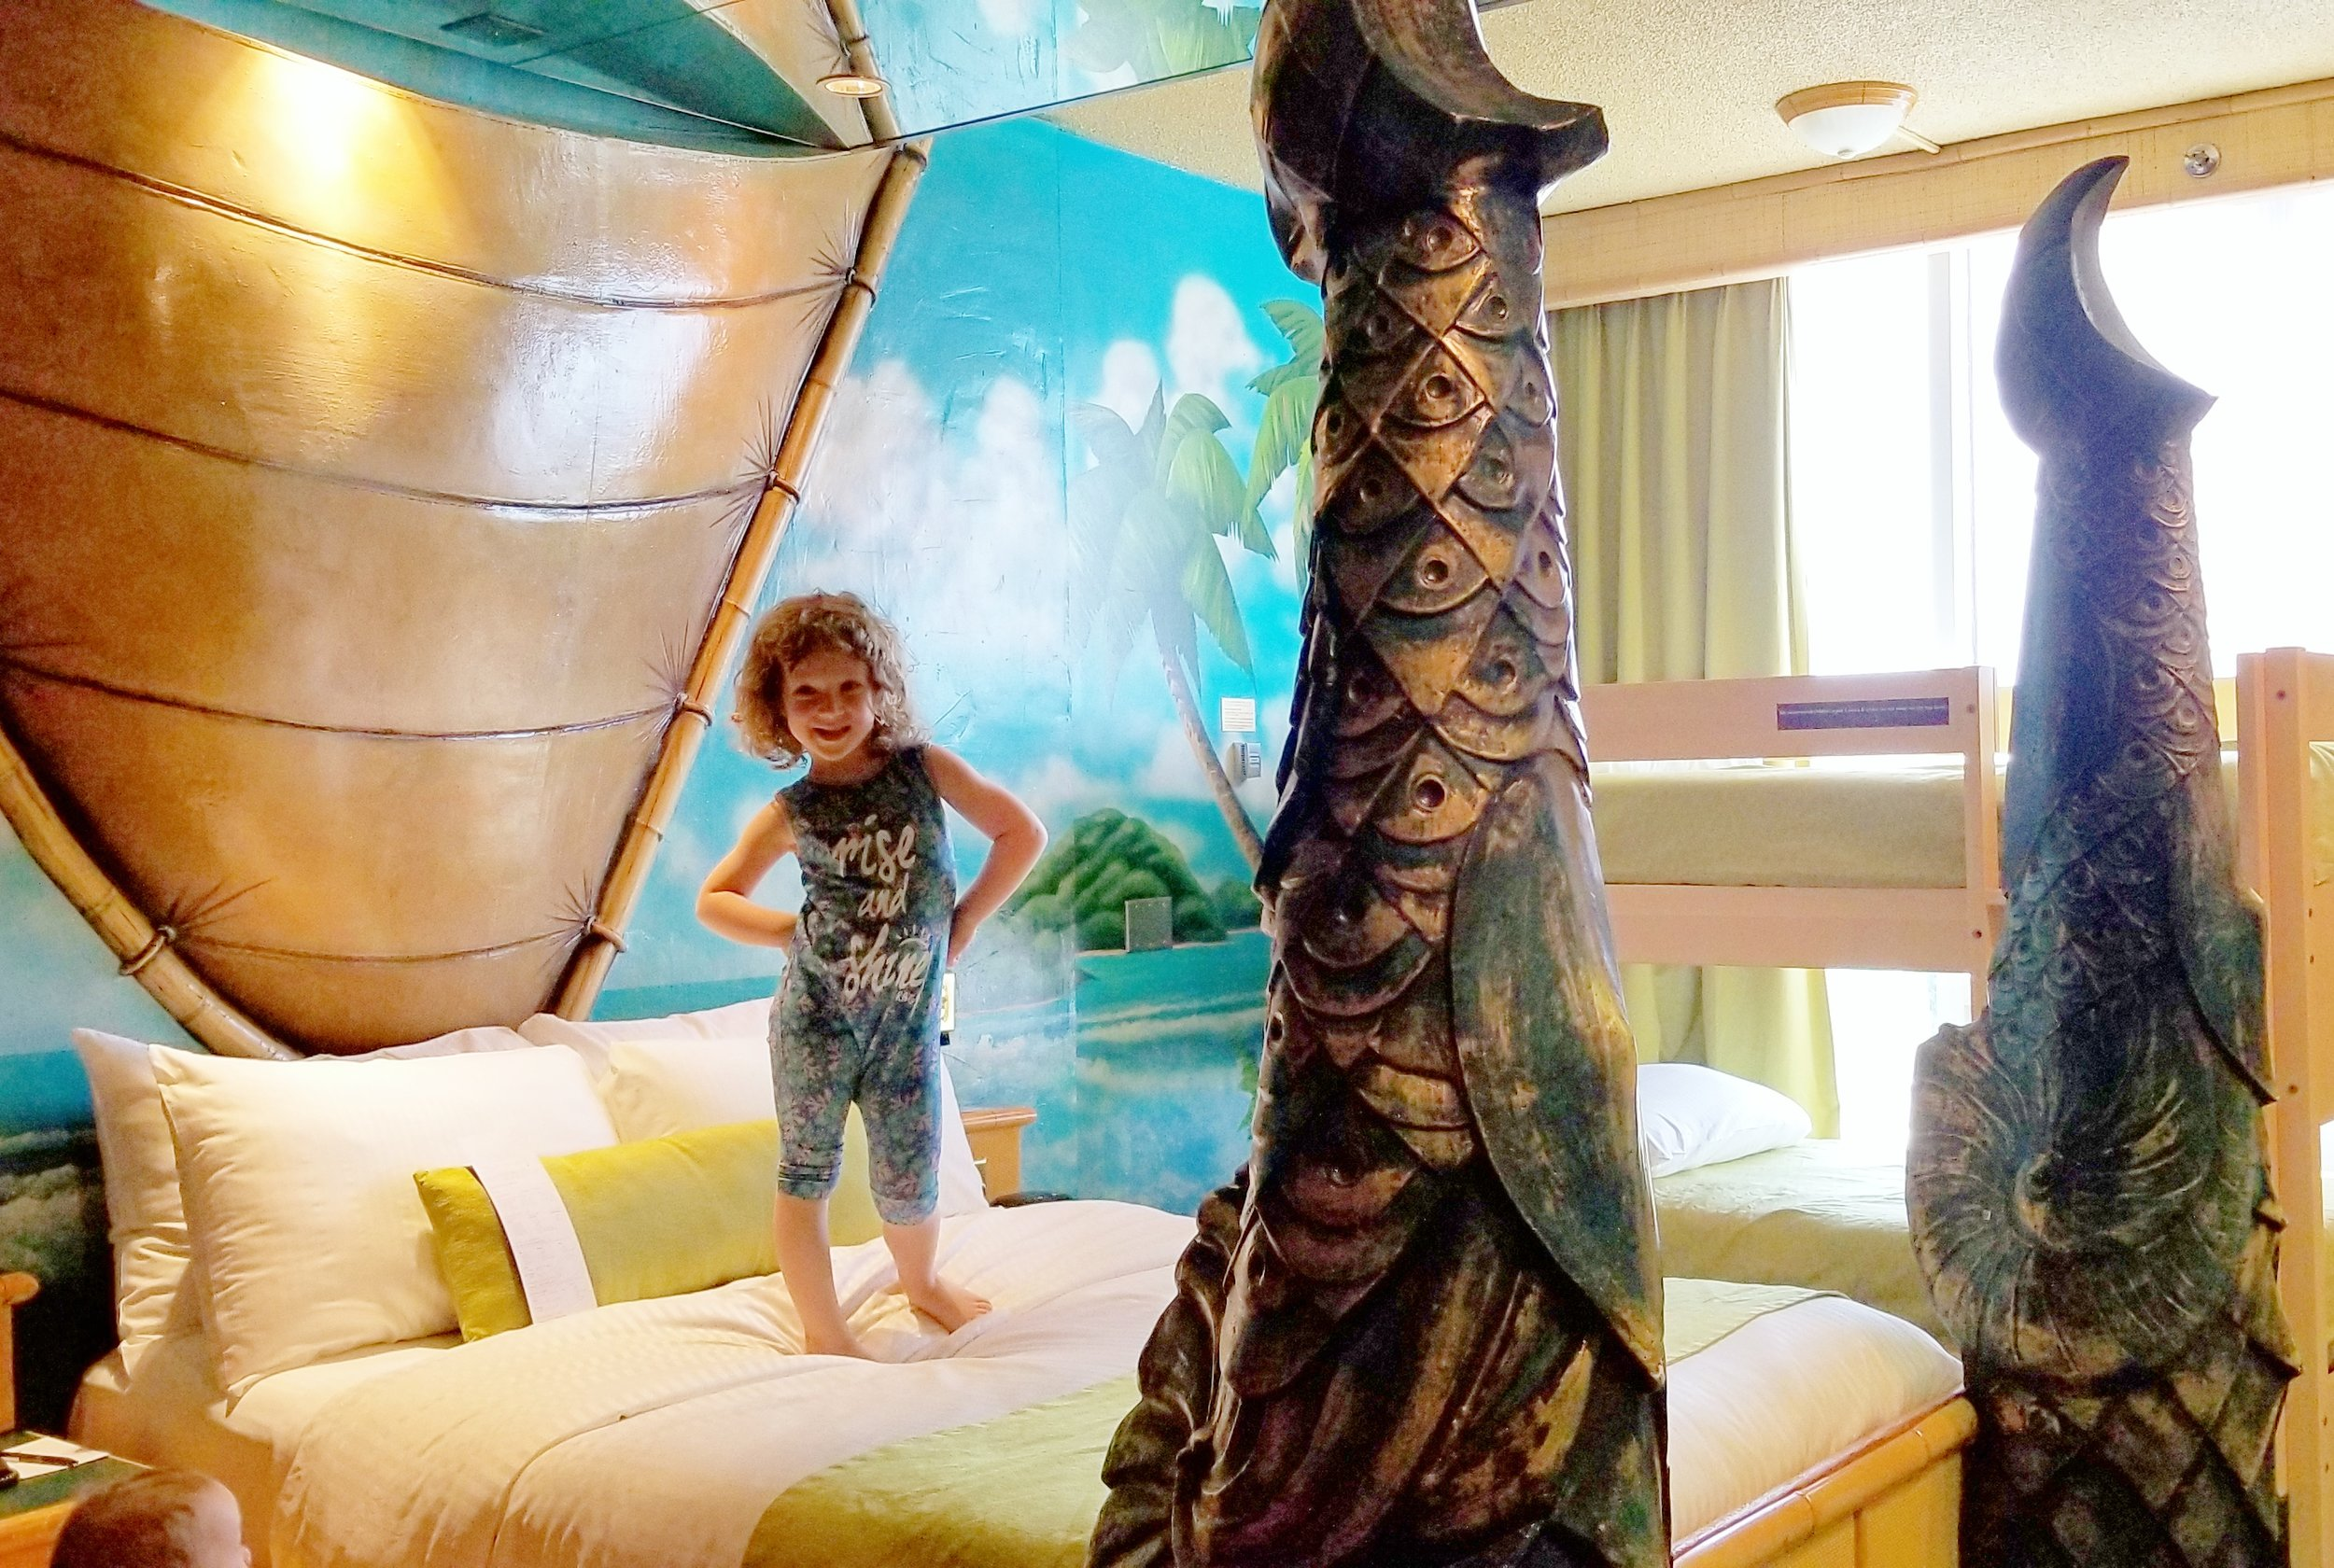 west edmonton mall fantasyland hotel theme room tips.jpg